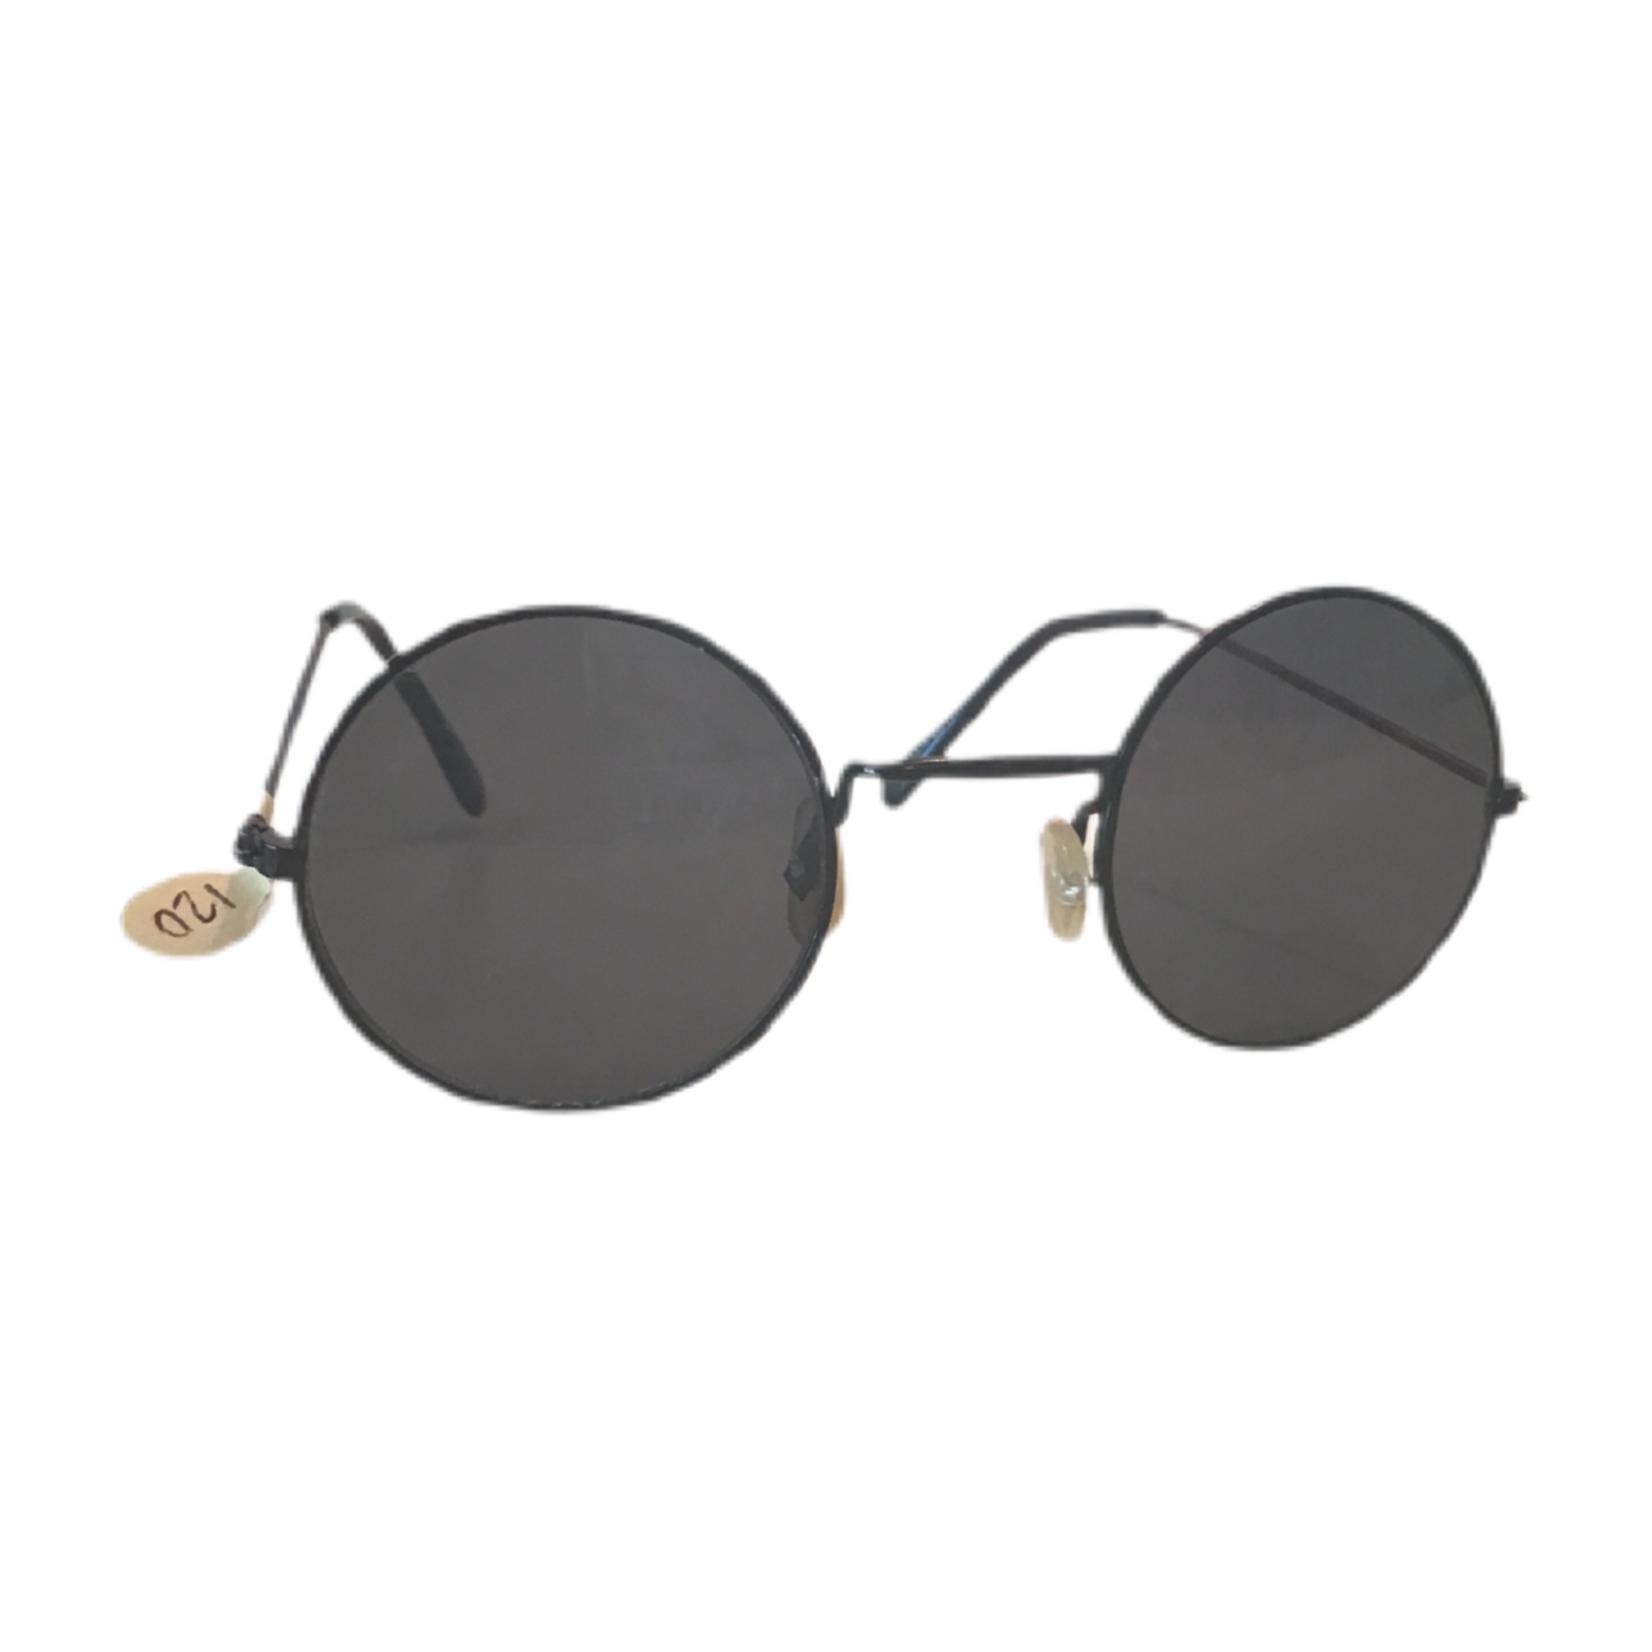 Wyld Blue Black circle sunglasses